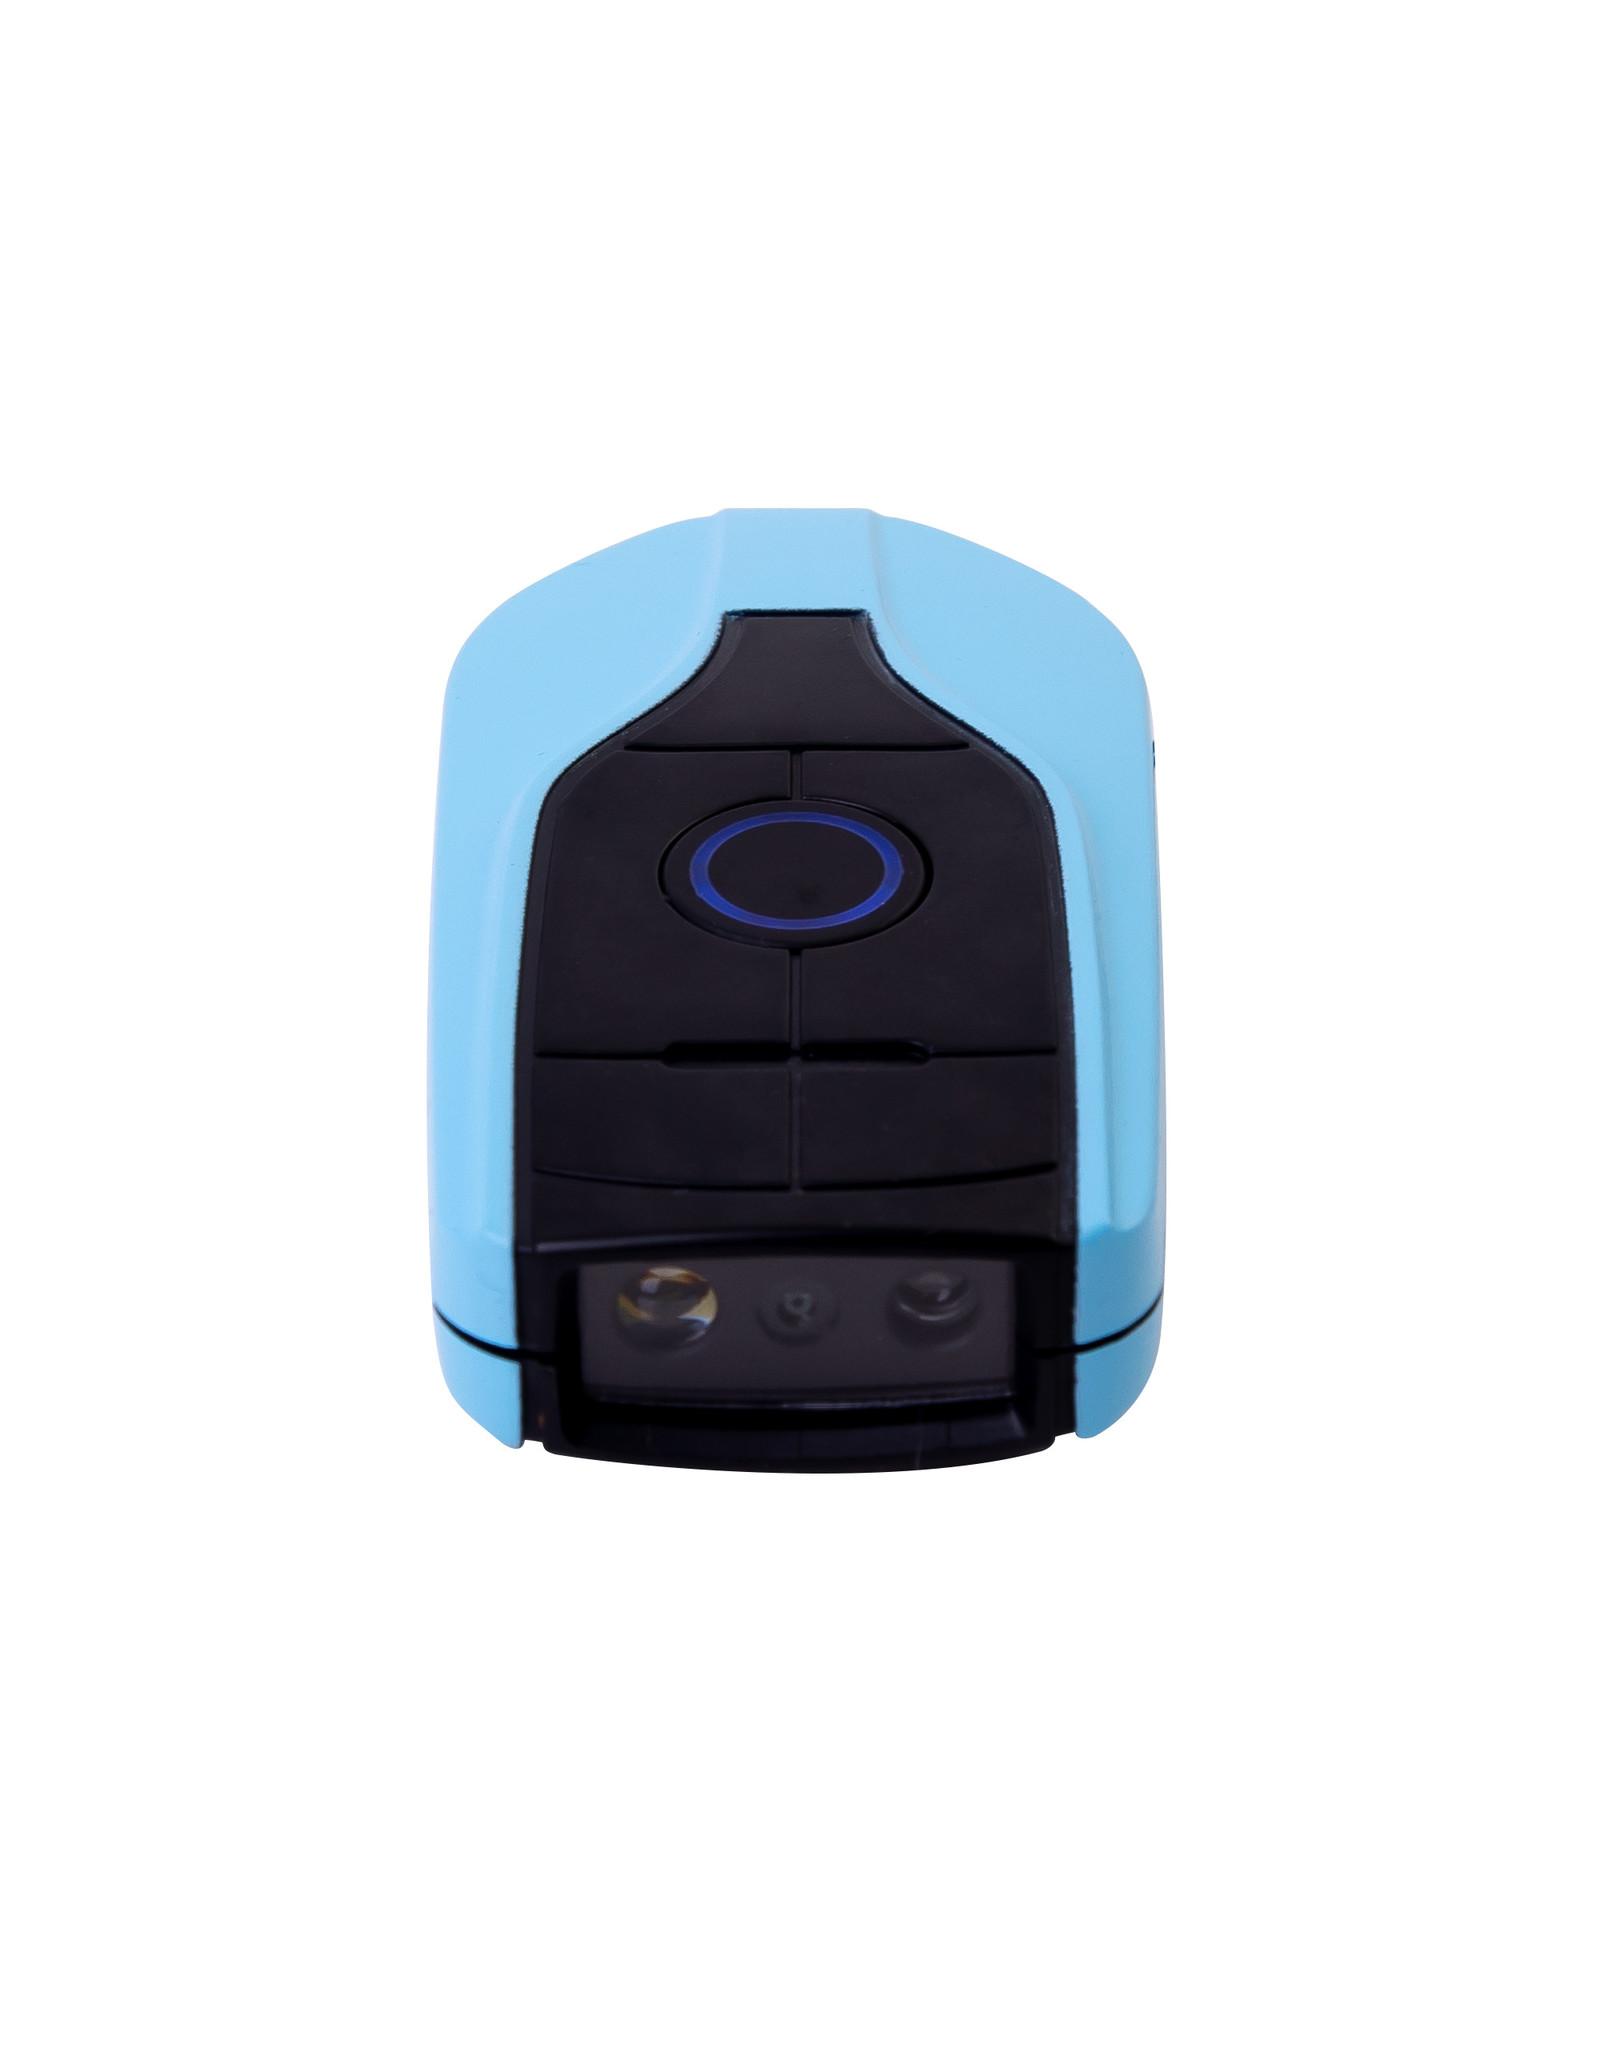 DTRONIC Bluetooth barcodescanner Mini - DTRONIC - DI9150